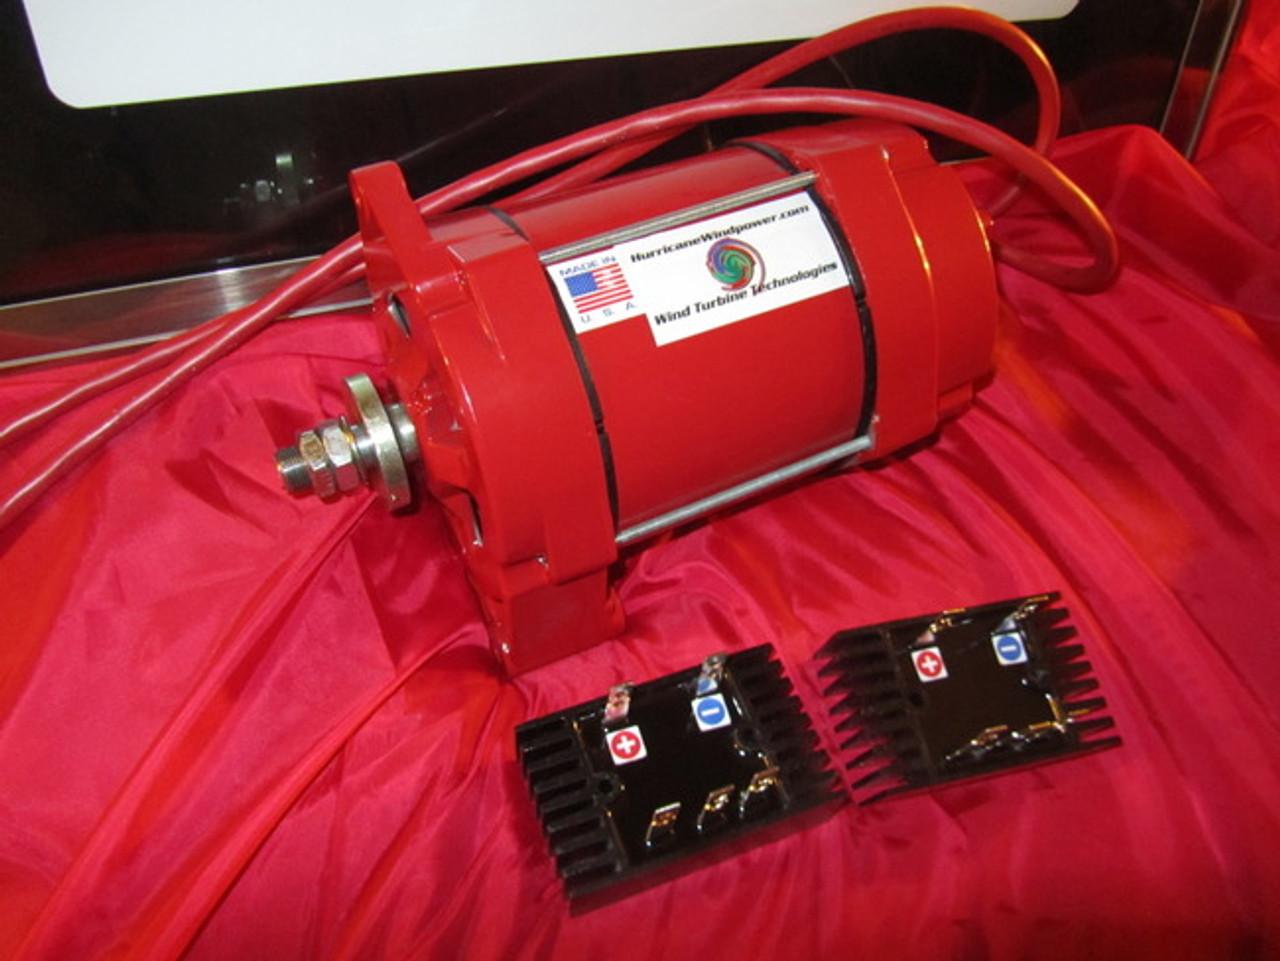 Hurricane Wind Power Permanent Magnet Alternator PMA 24V Dual Output Wind Generator